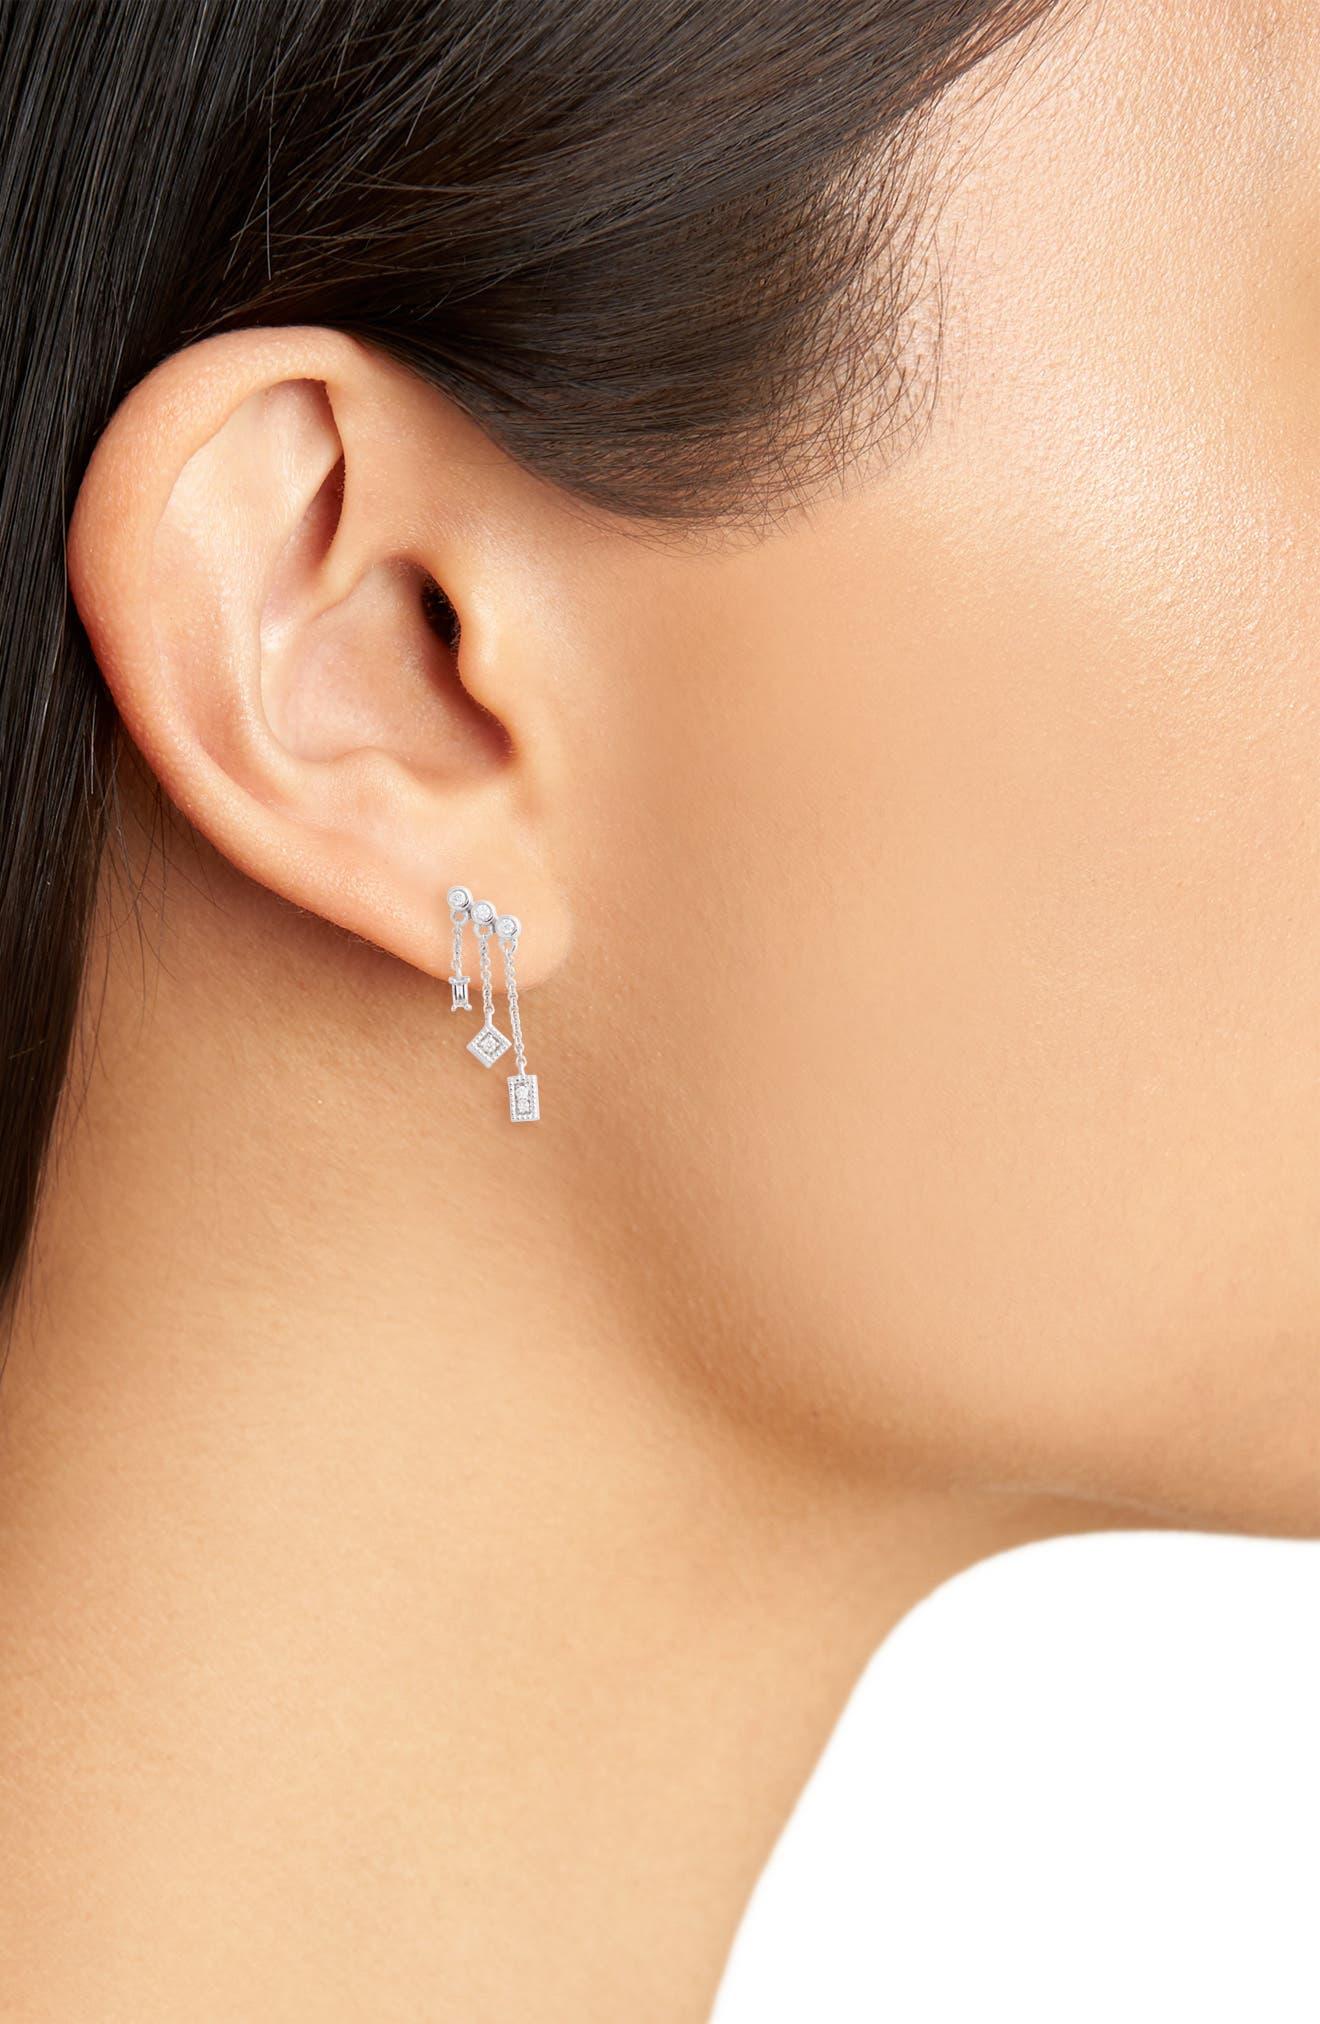 Lisa Michelle Diamond Drop Earrings,                             Alternate thumbnail 2, color,                             WHITE GOLD